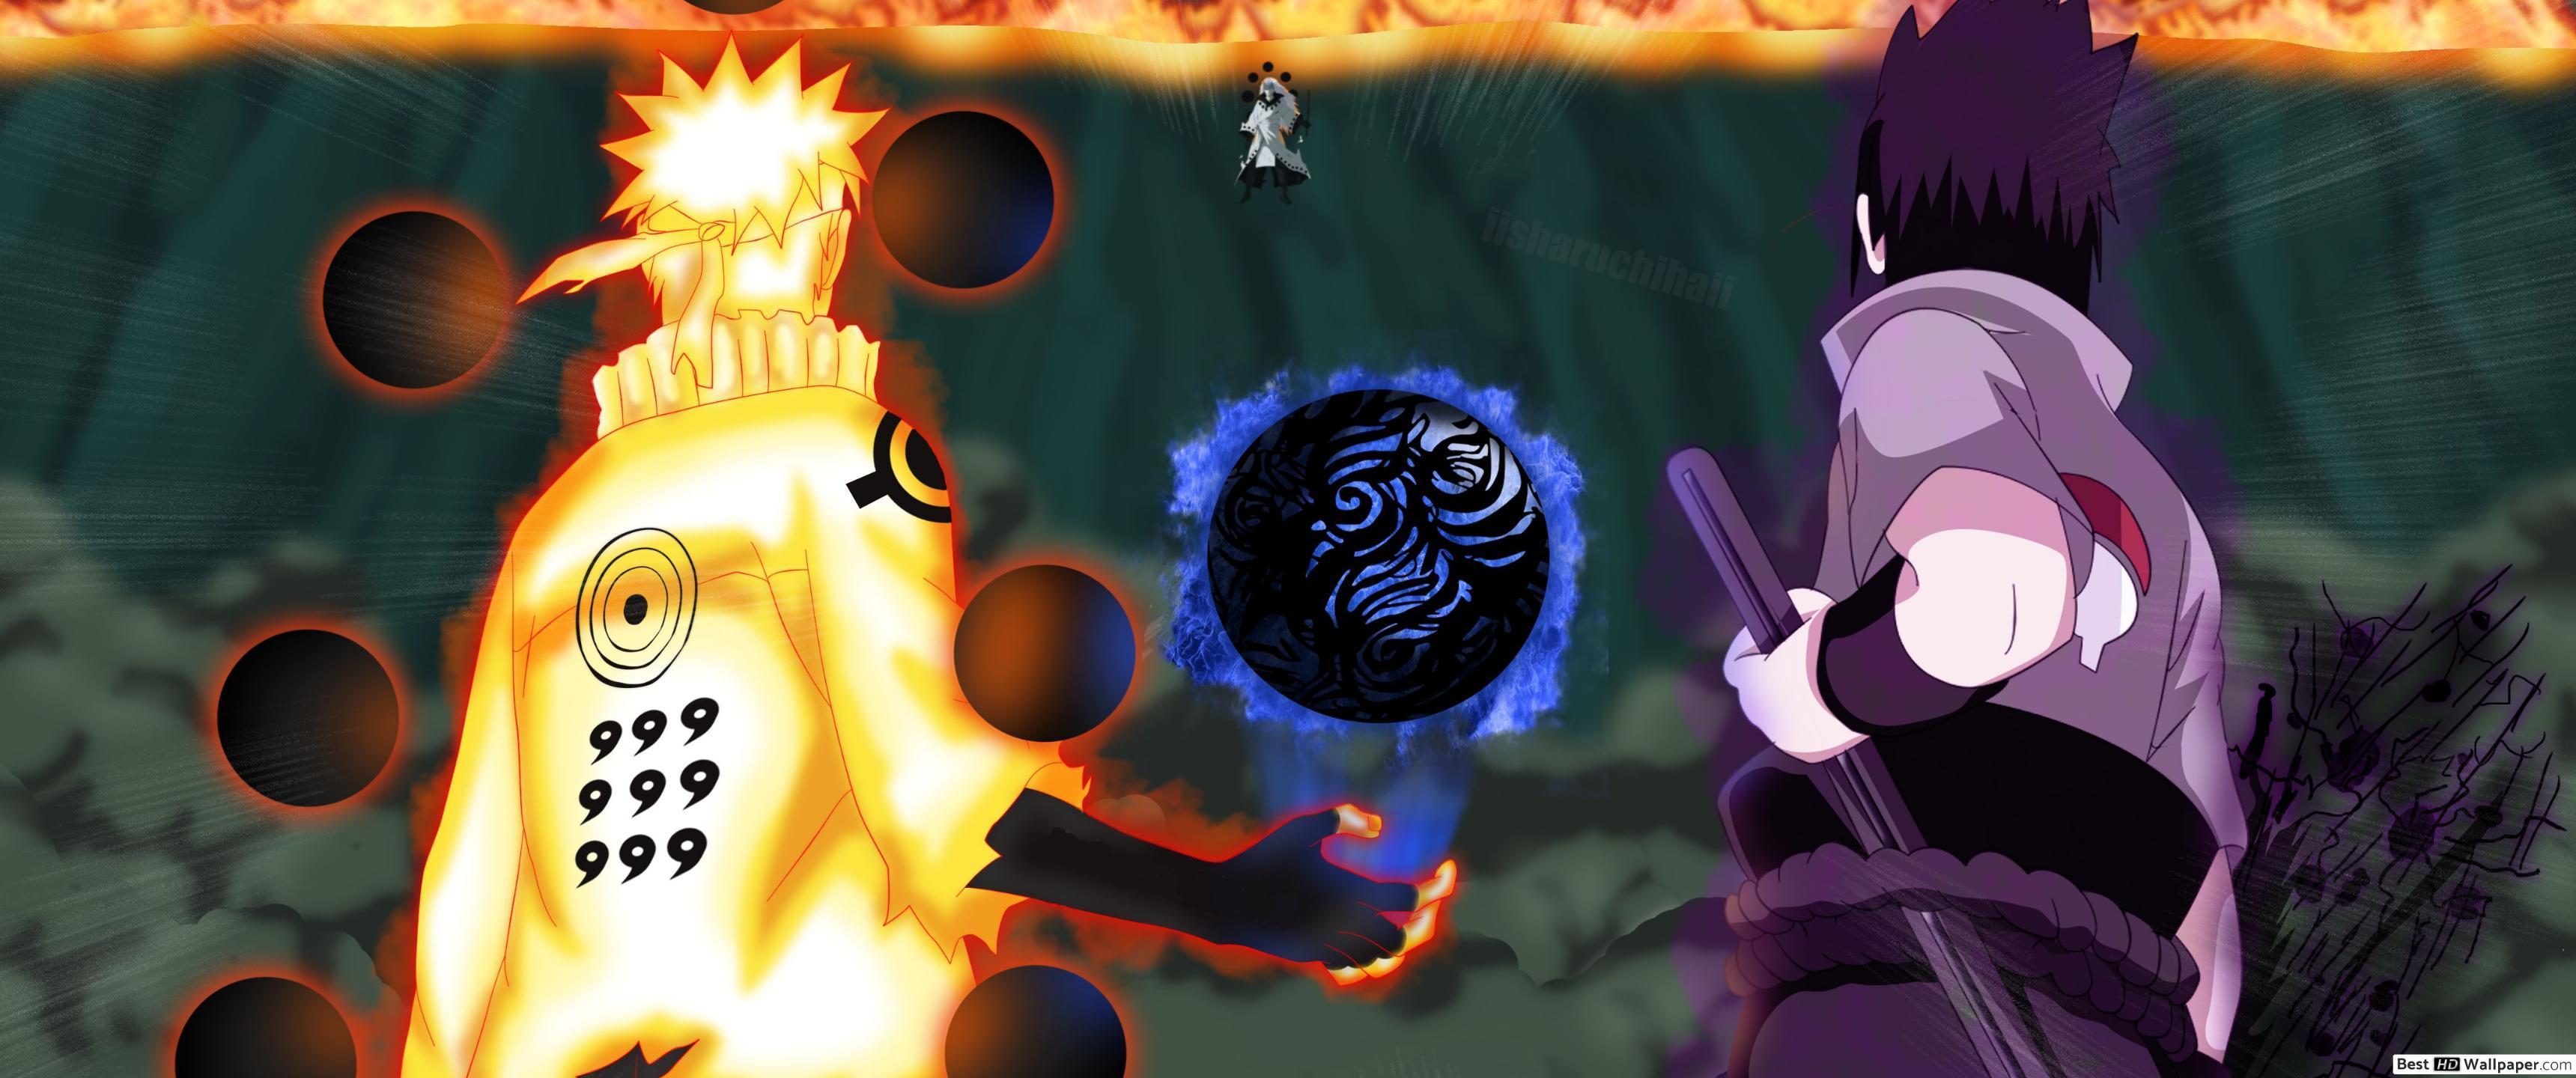 Naruto Elements Wallpapers - Wallpaper Cave